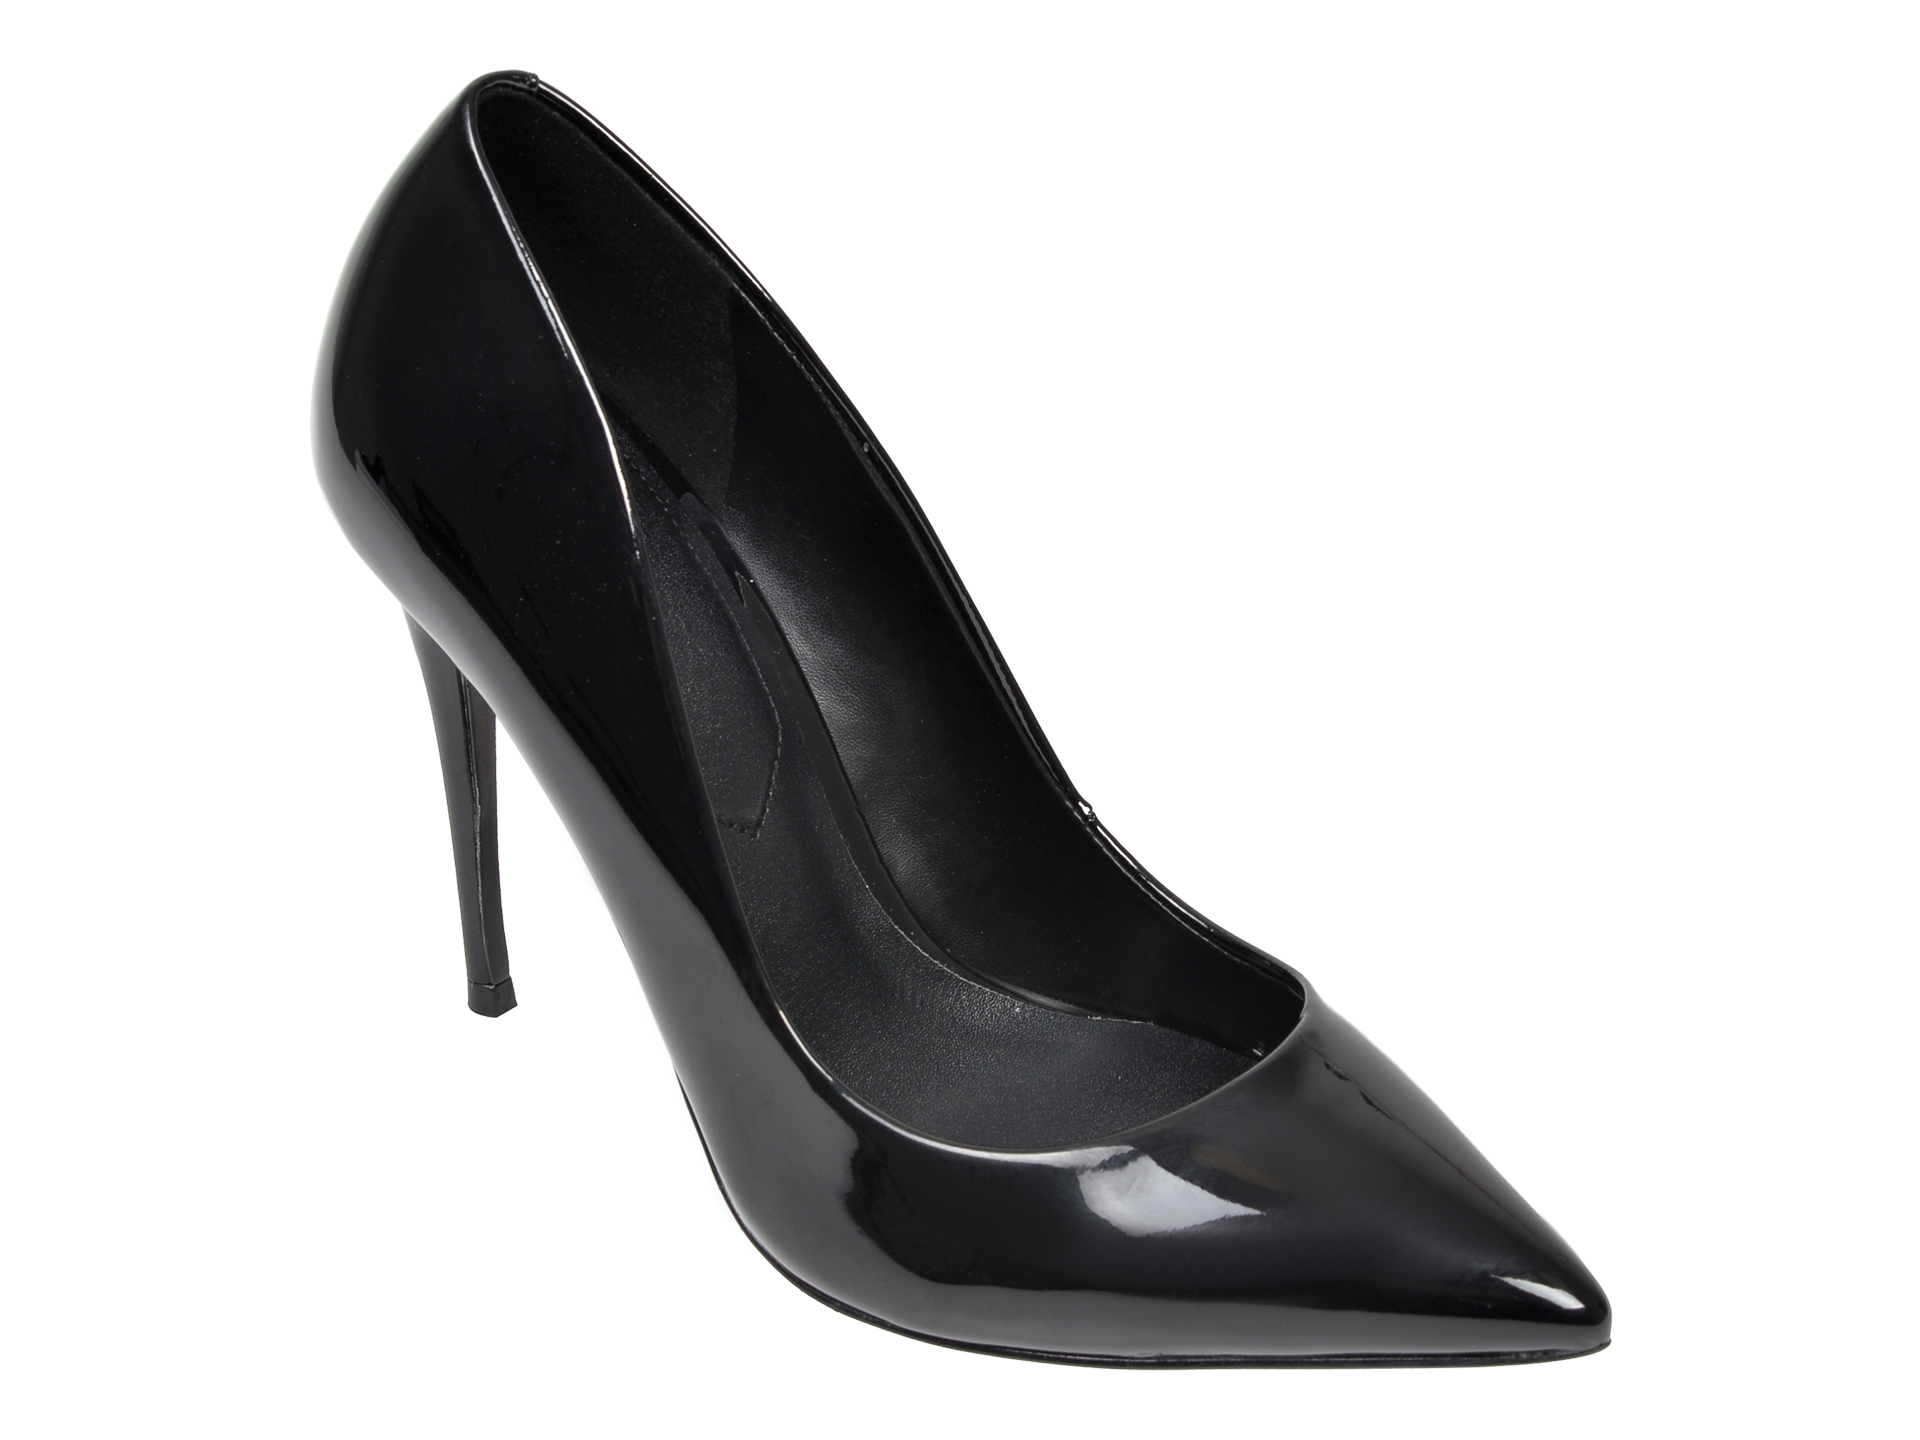 Pantofi ALDO negri, Stessy_009, din piele ecologica imagine otter.ro